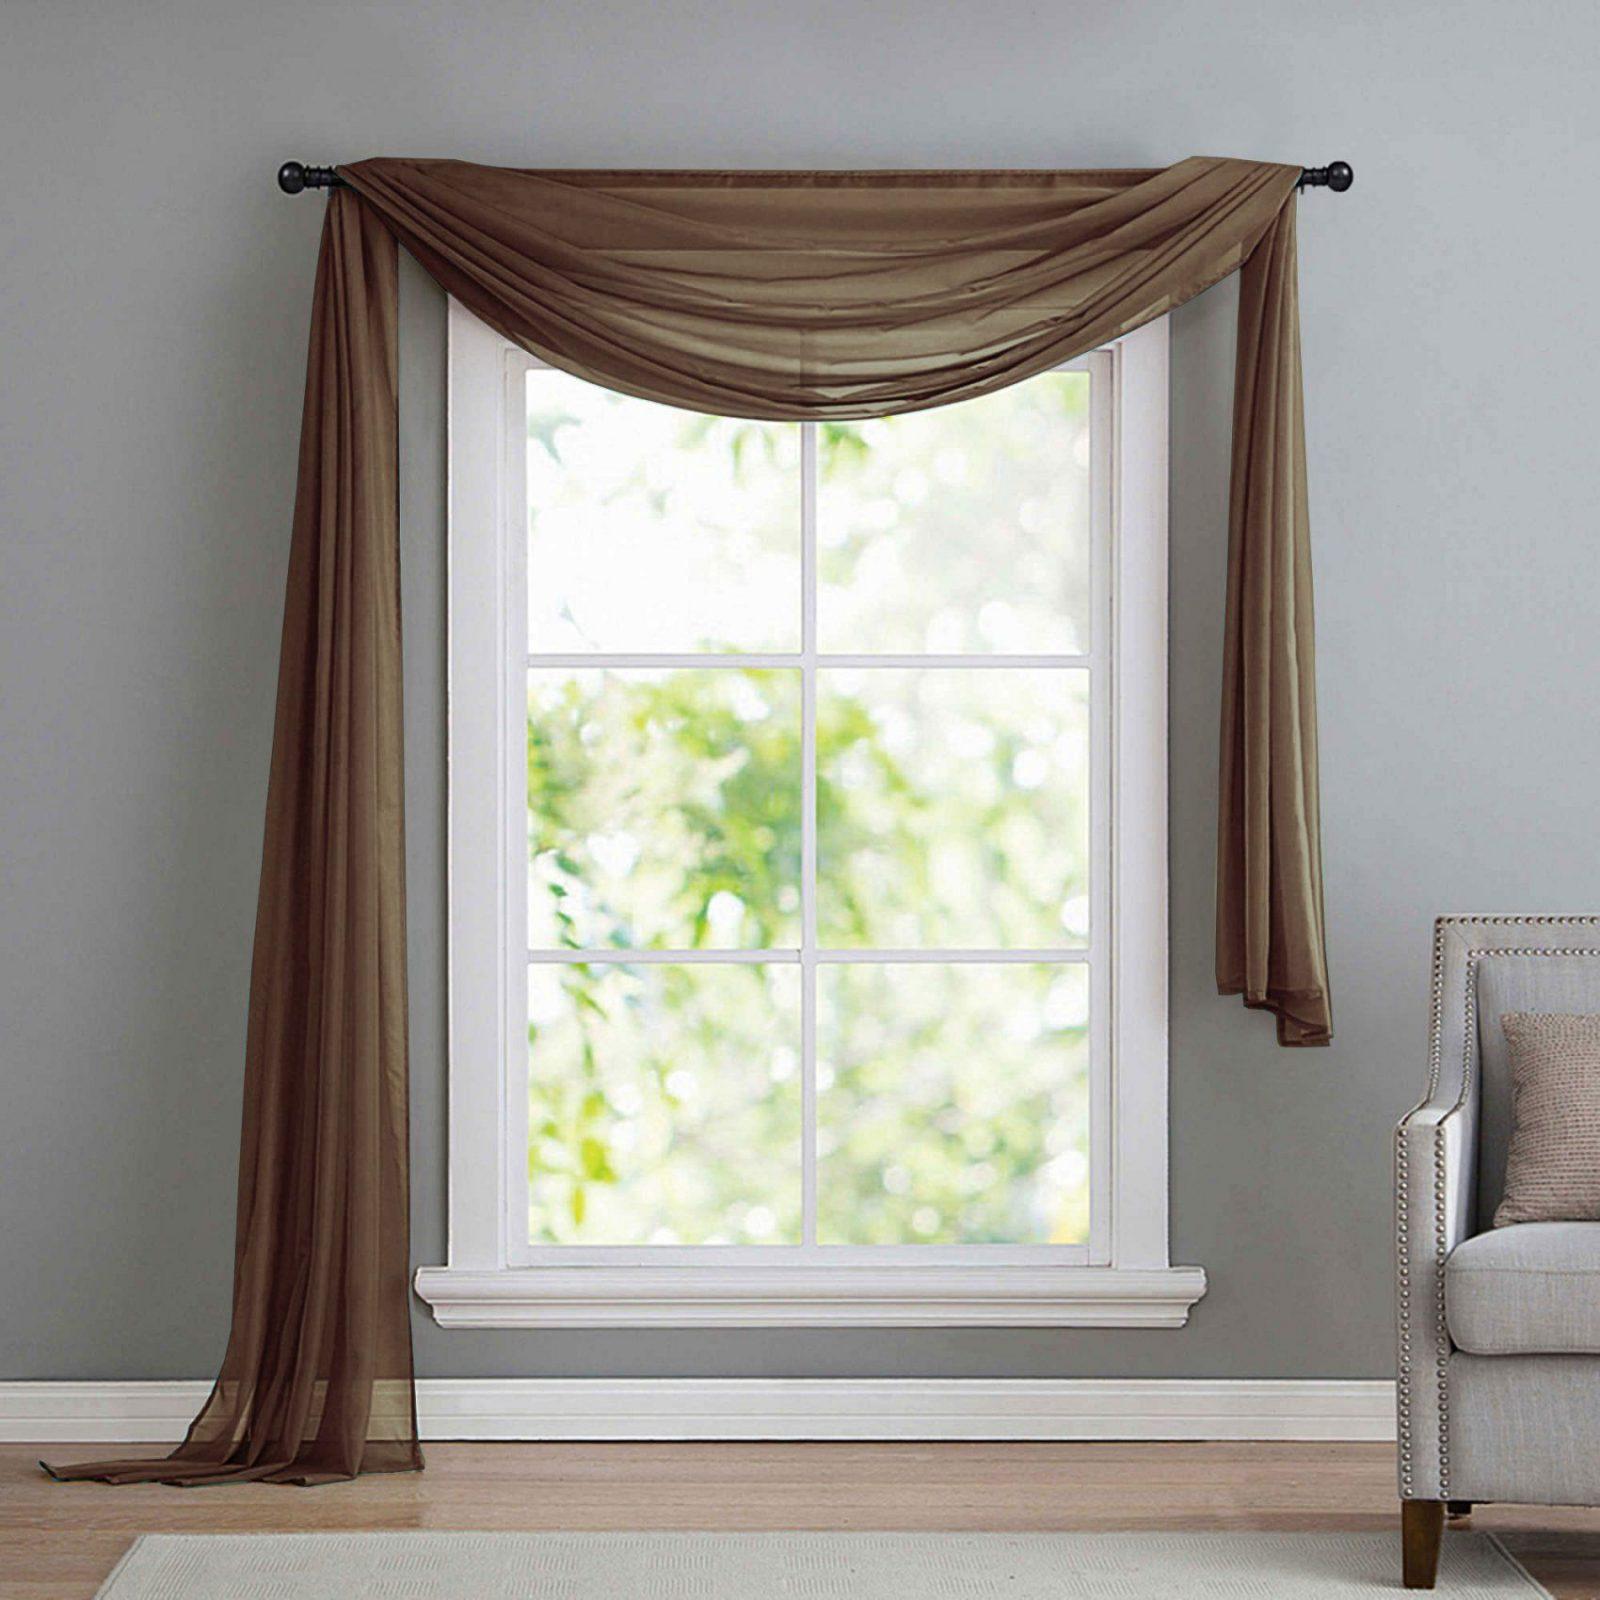 schrge gardinen elegant with schrge gardinen elegant fabulous gardinen wohnzimmer mit gardinen. Black Bedroom Furniture Sets. Home Design Ideas